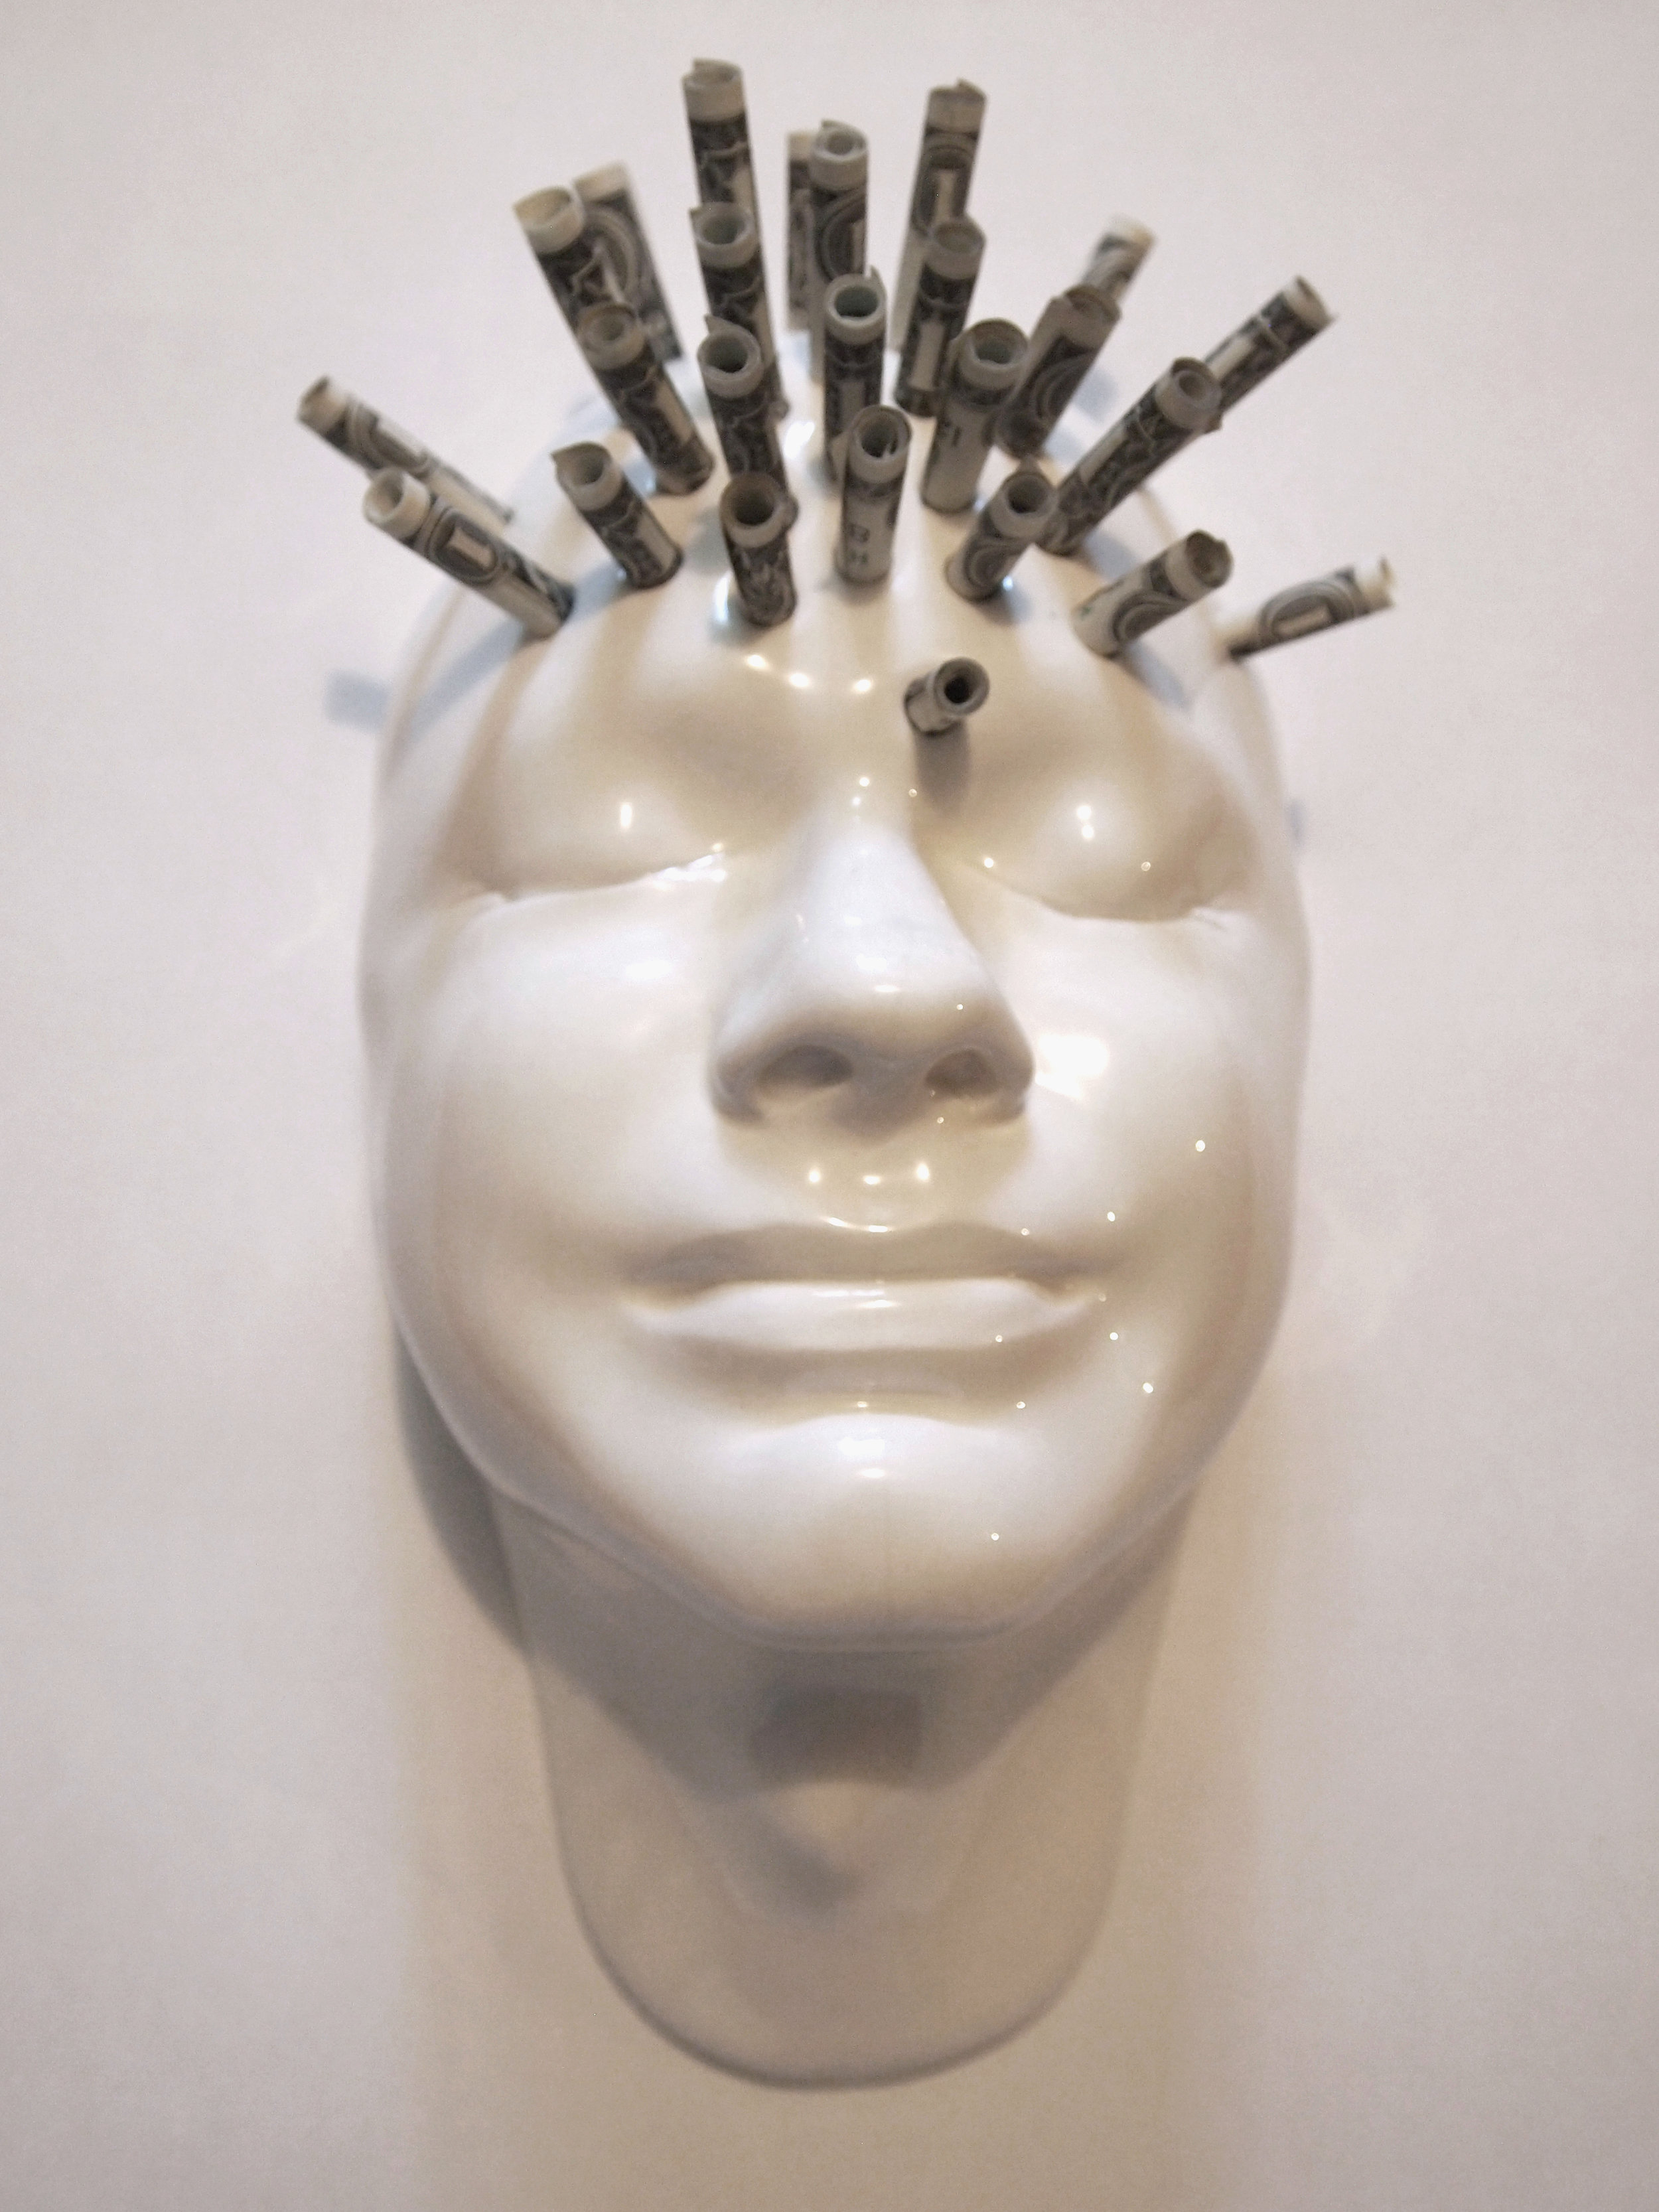 Craig Paul Nowak ceramic face dollar money on mind art sculpture